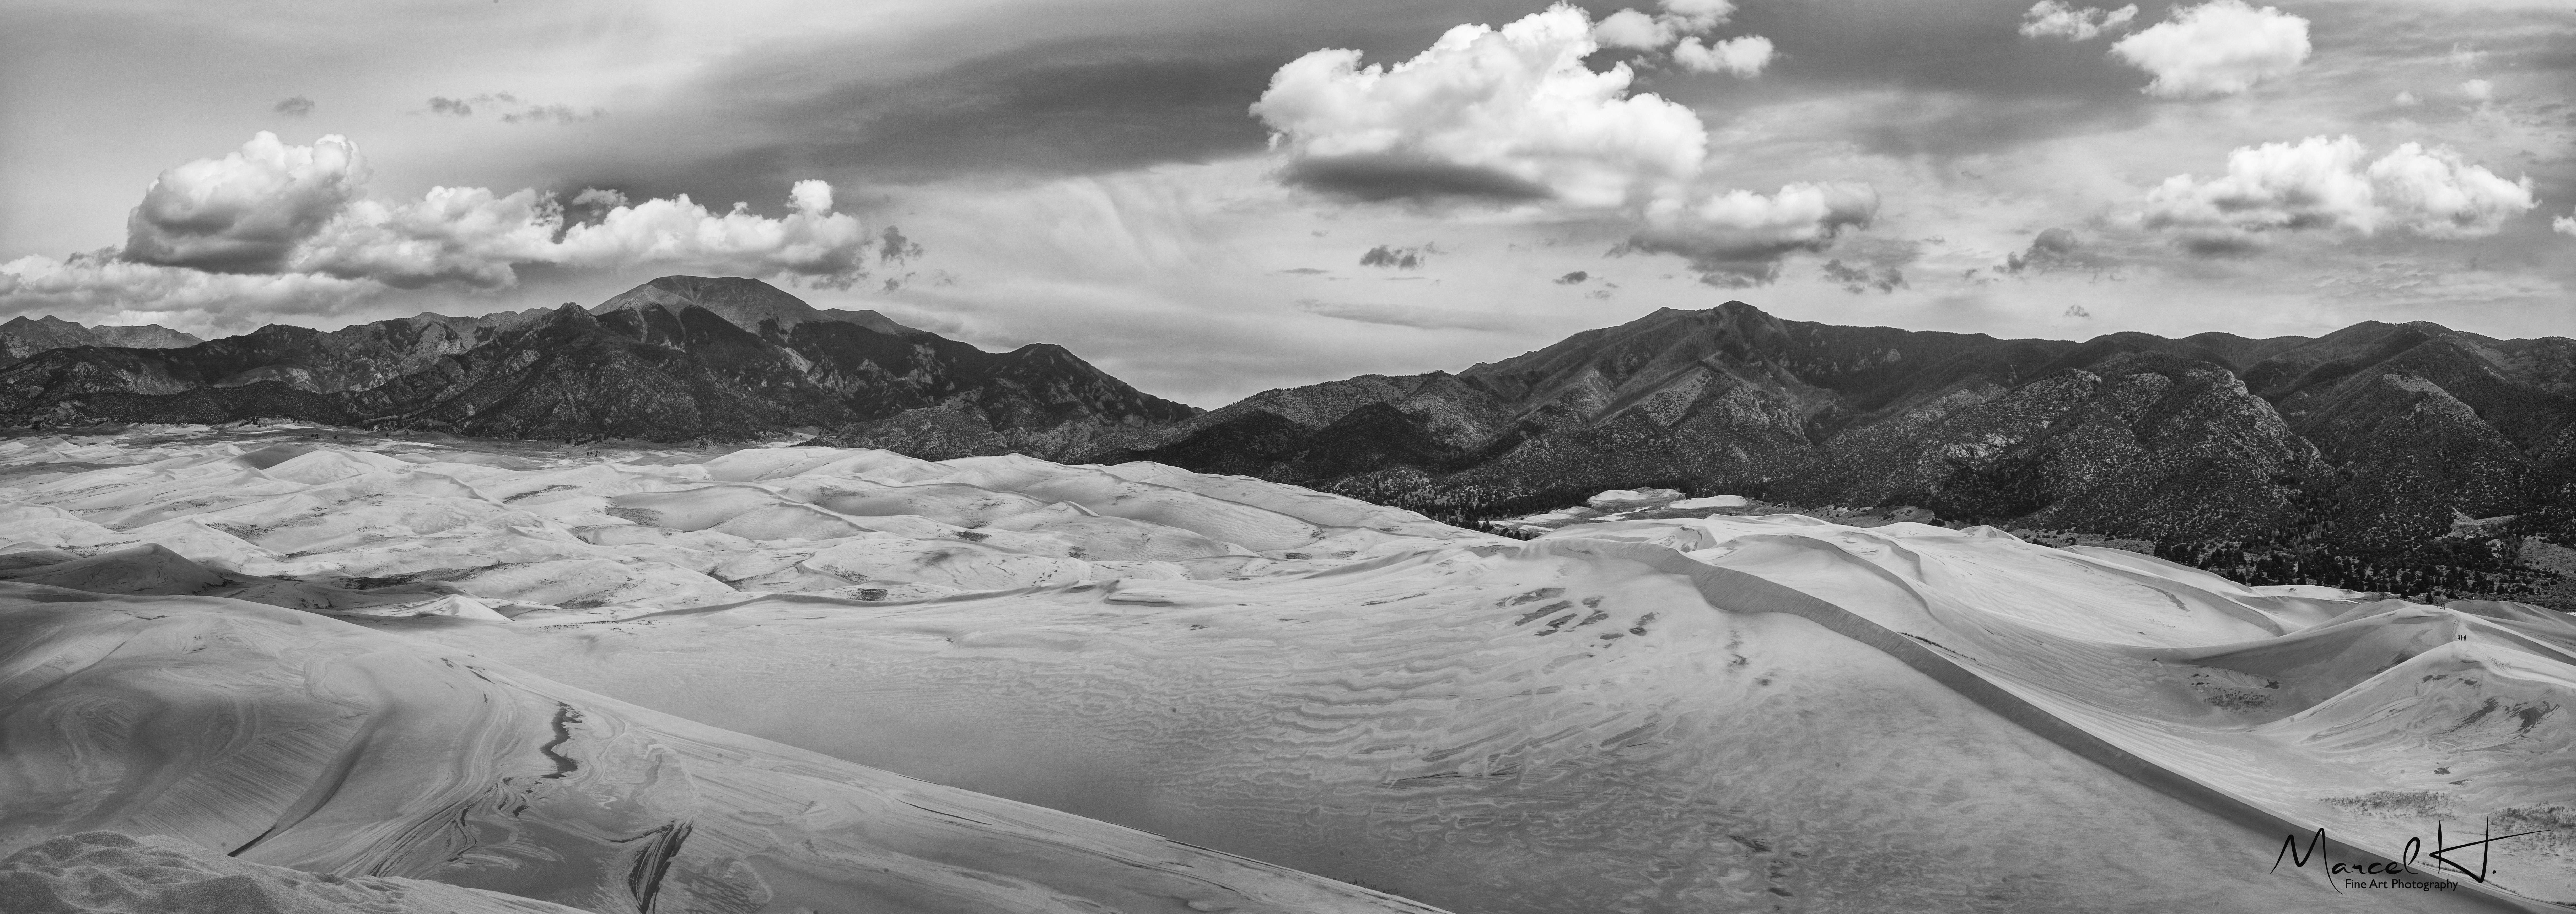 Great_Sand_Dunes